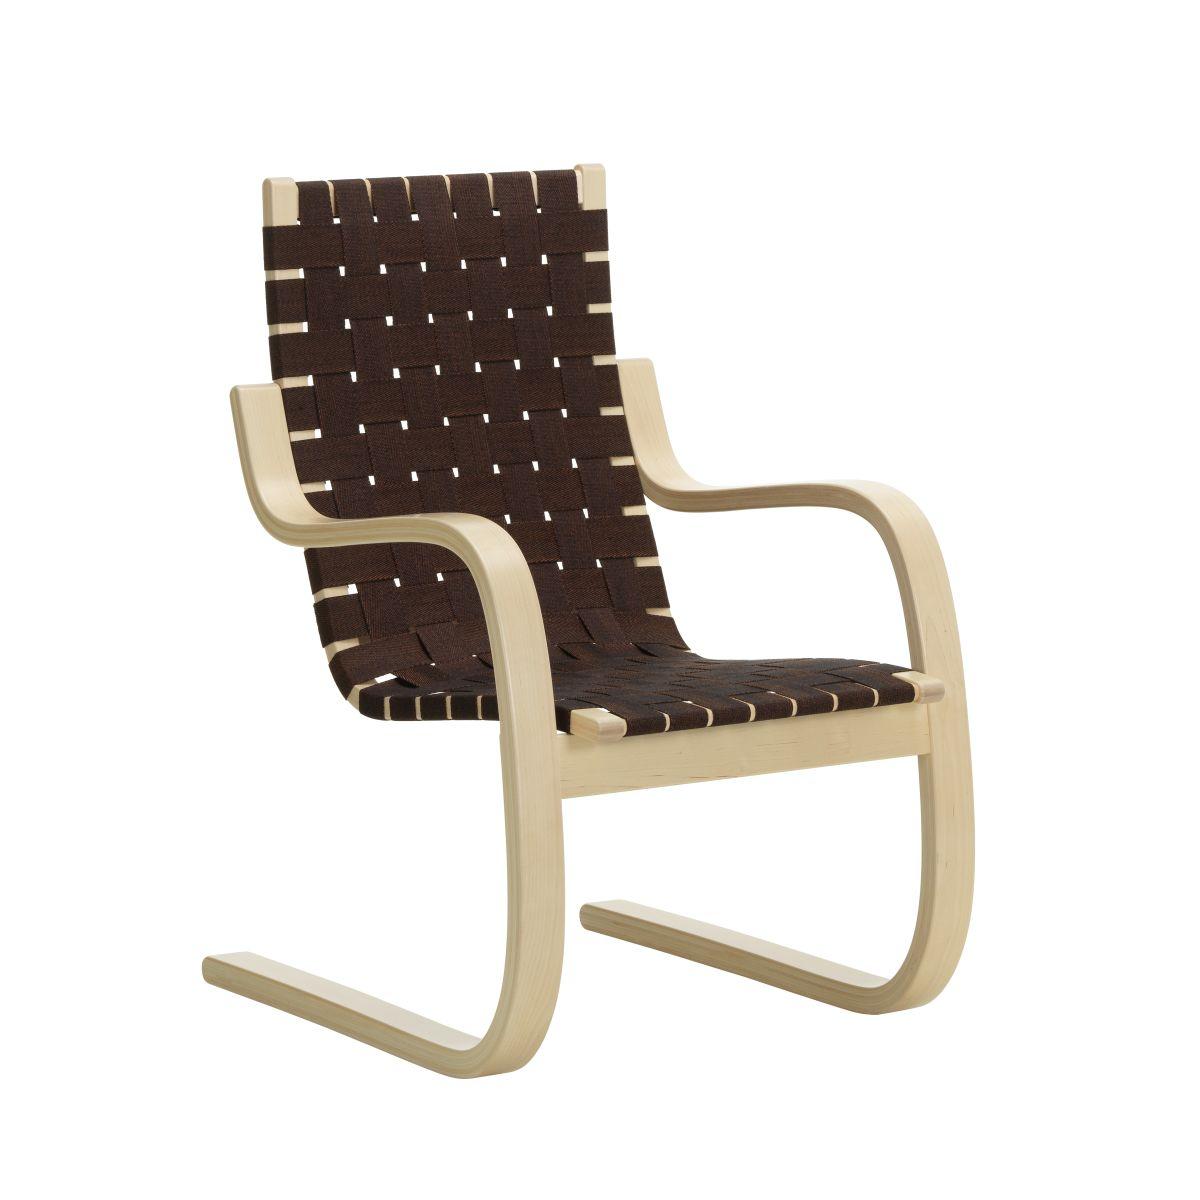 Armchair 406 natural, black/brown webbing_F